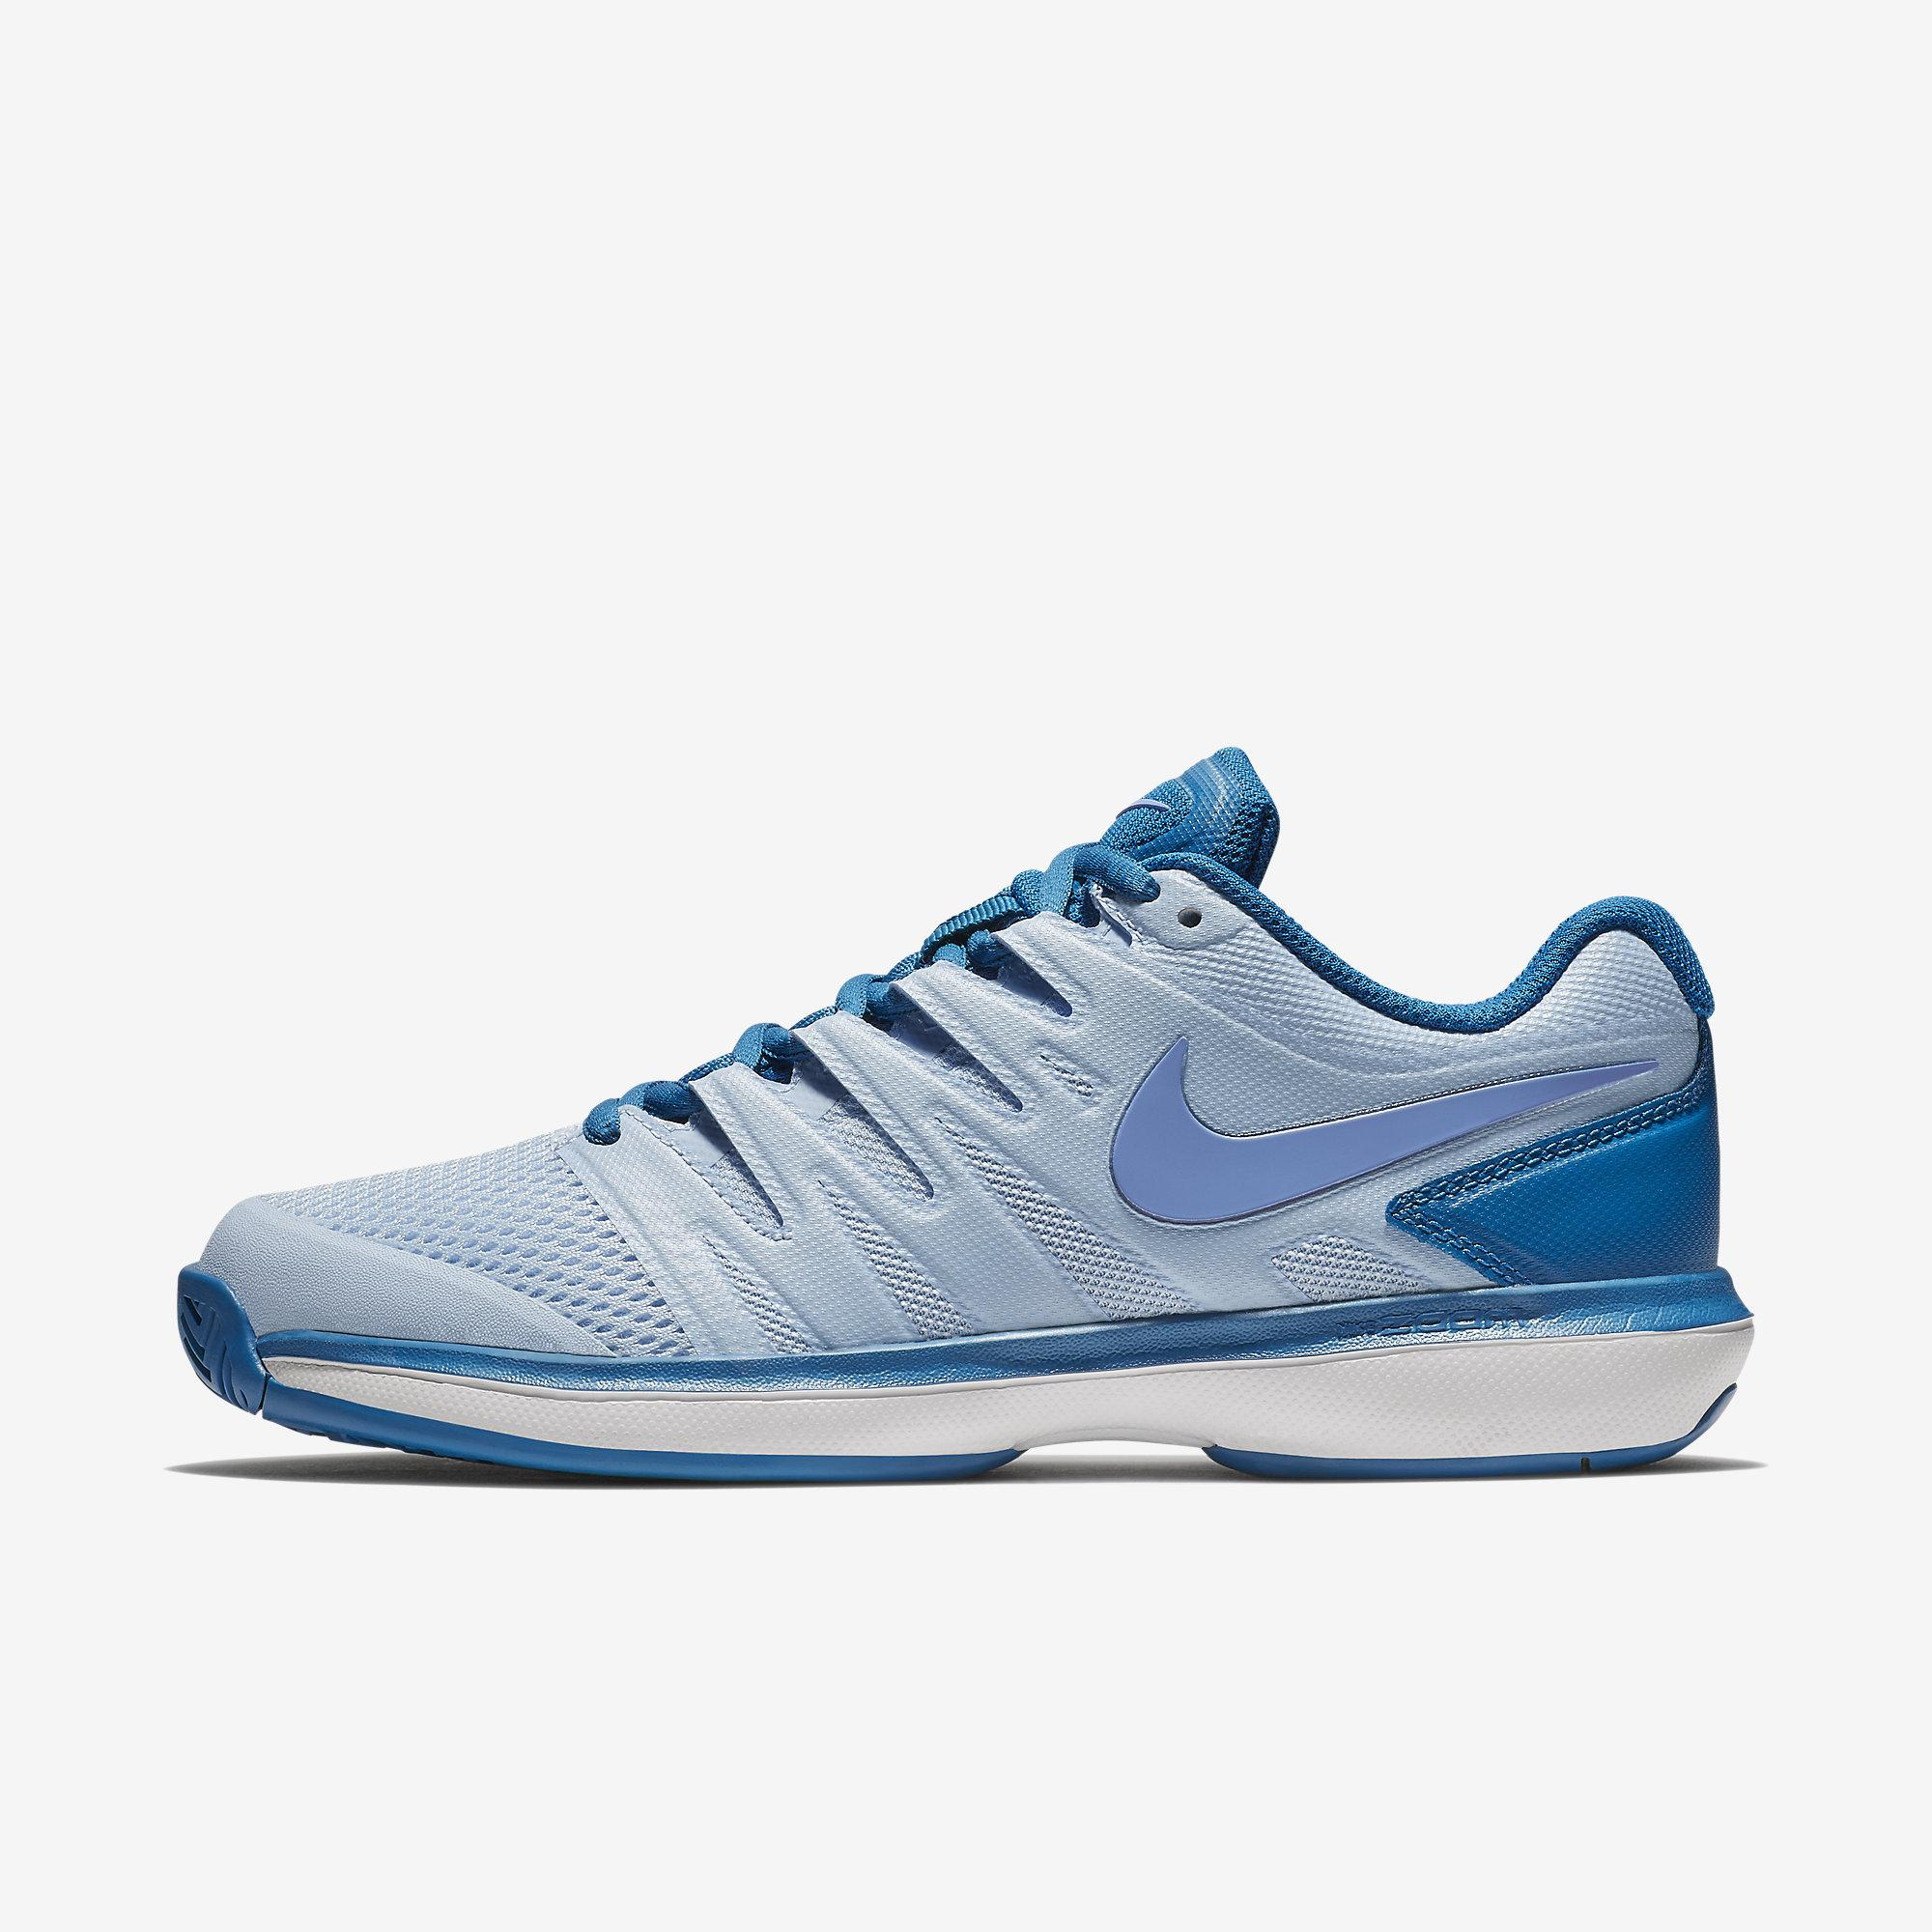 de3f4797a6a66 Nike Womens Air Zoom Prestige Tennis Shoes - Royal Tint Military Blue -  Tennisnuts.com